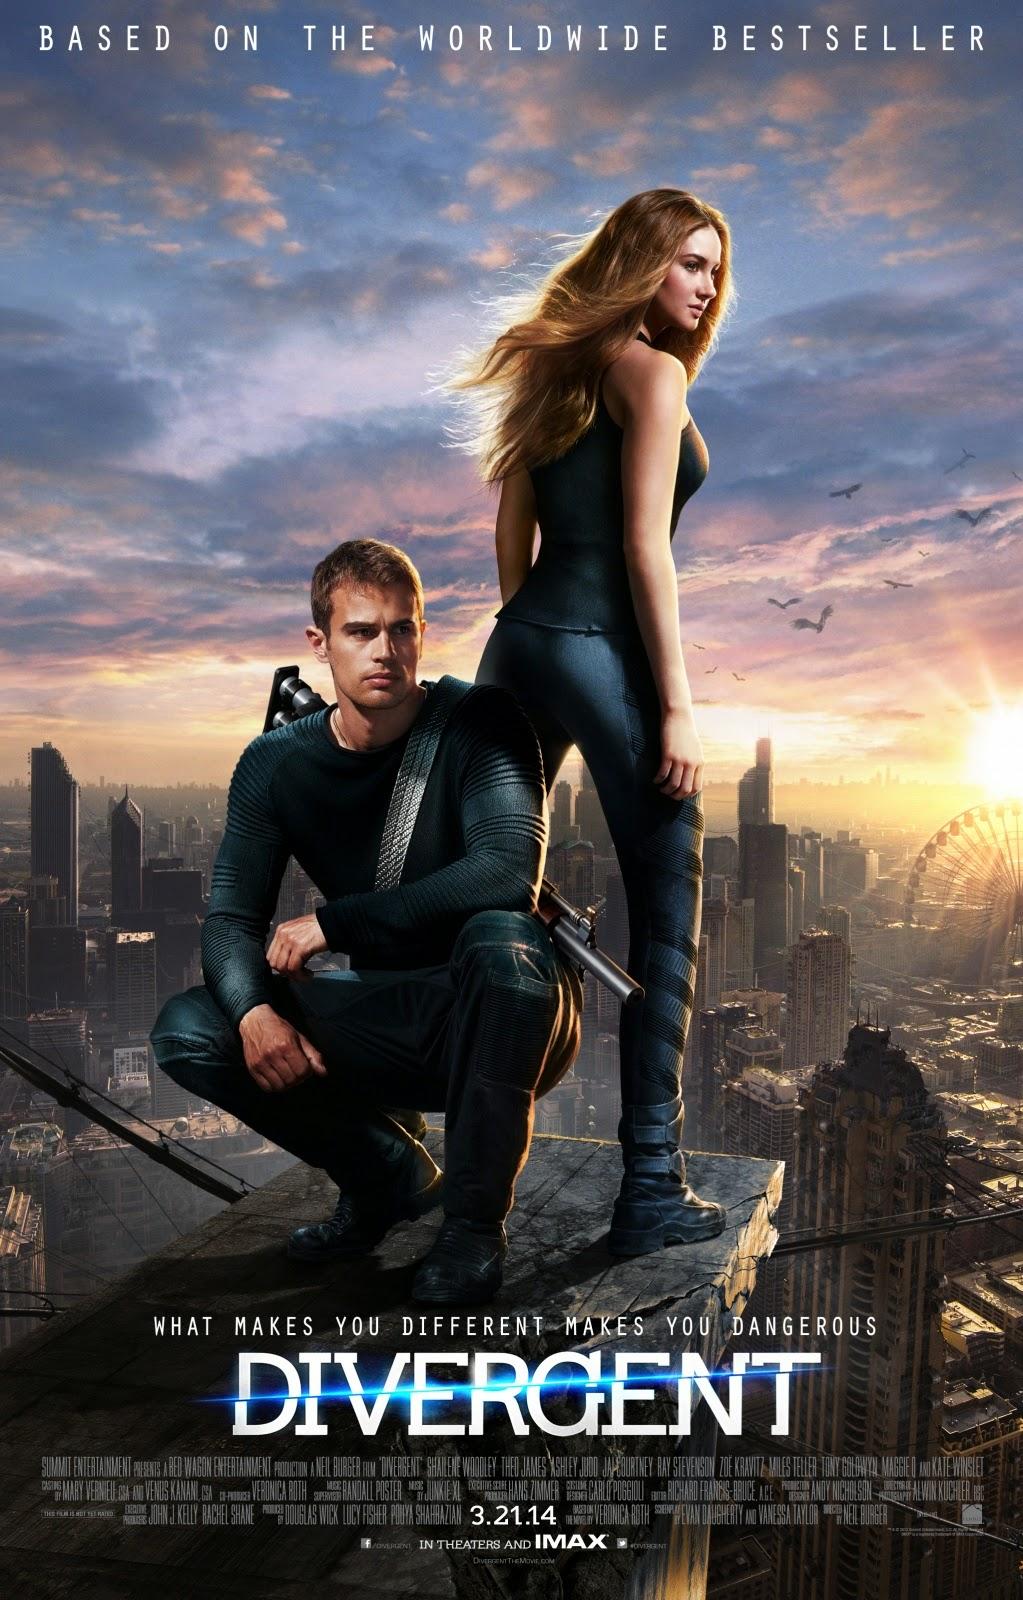 Divergent by Neil Burger